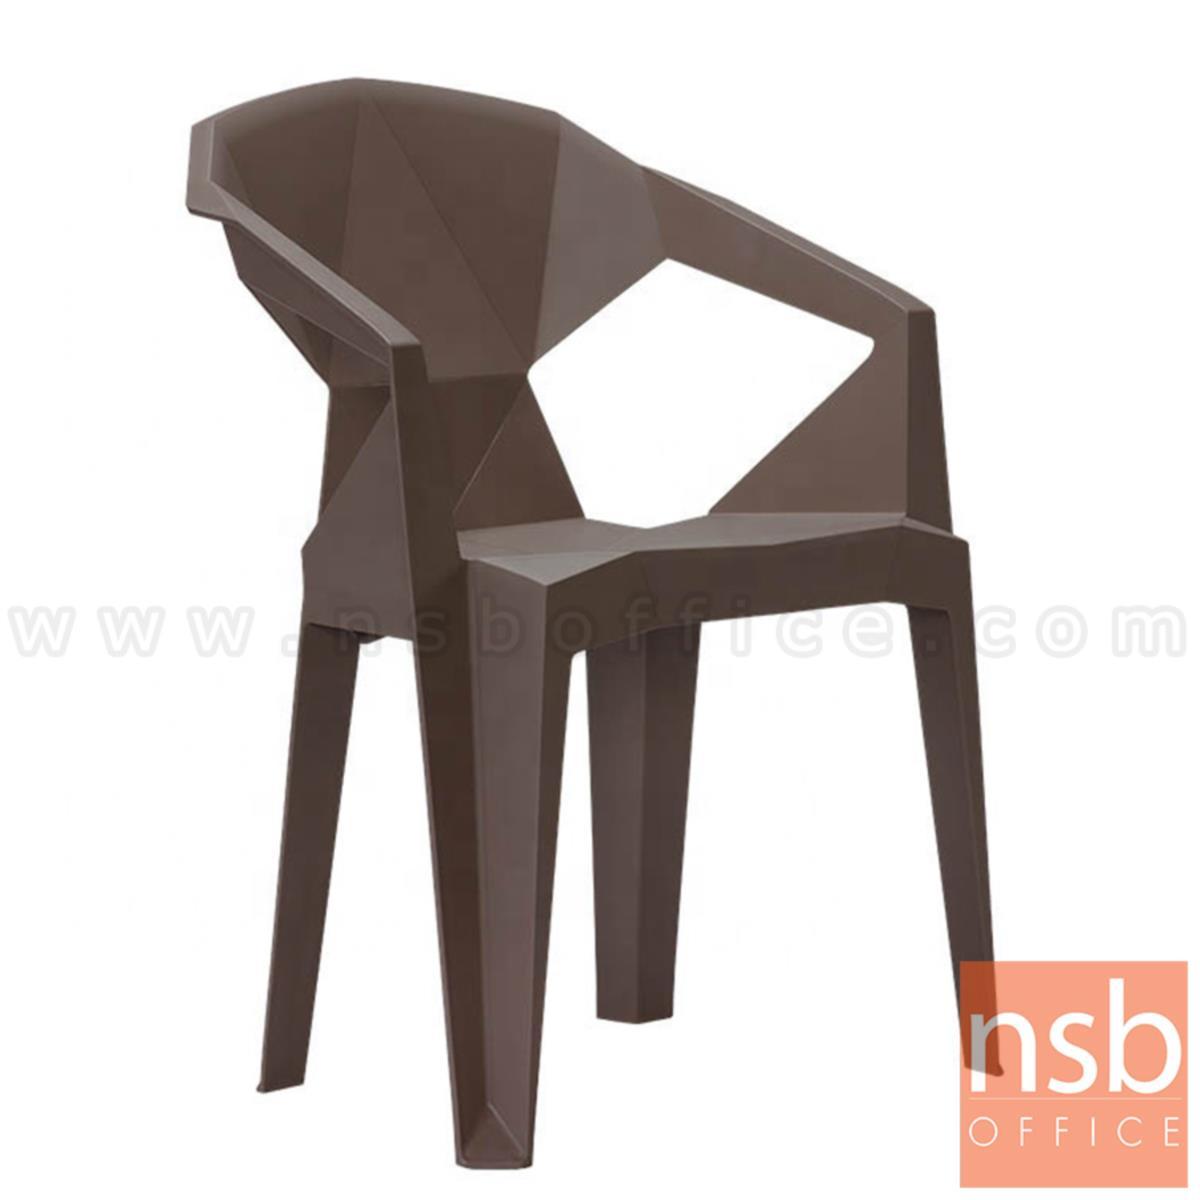 B11A037:เก้าอี้โมเดิร์นพลาสติกล้วน รุ่น Renton (เรนตัน) ขนาด 57W cm.